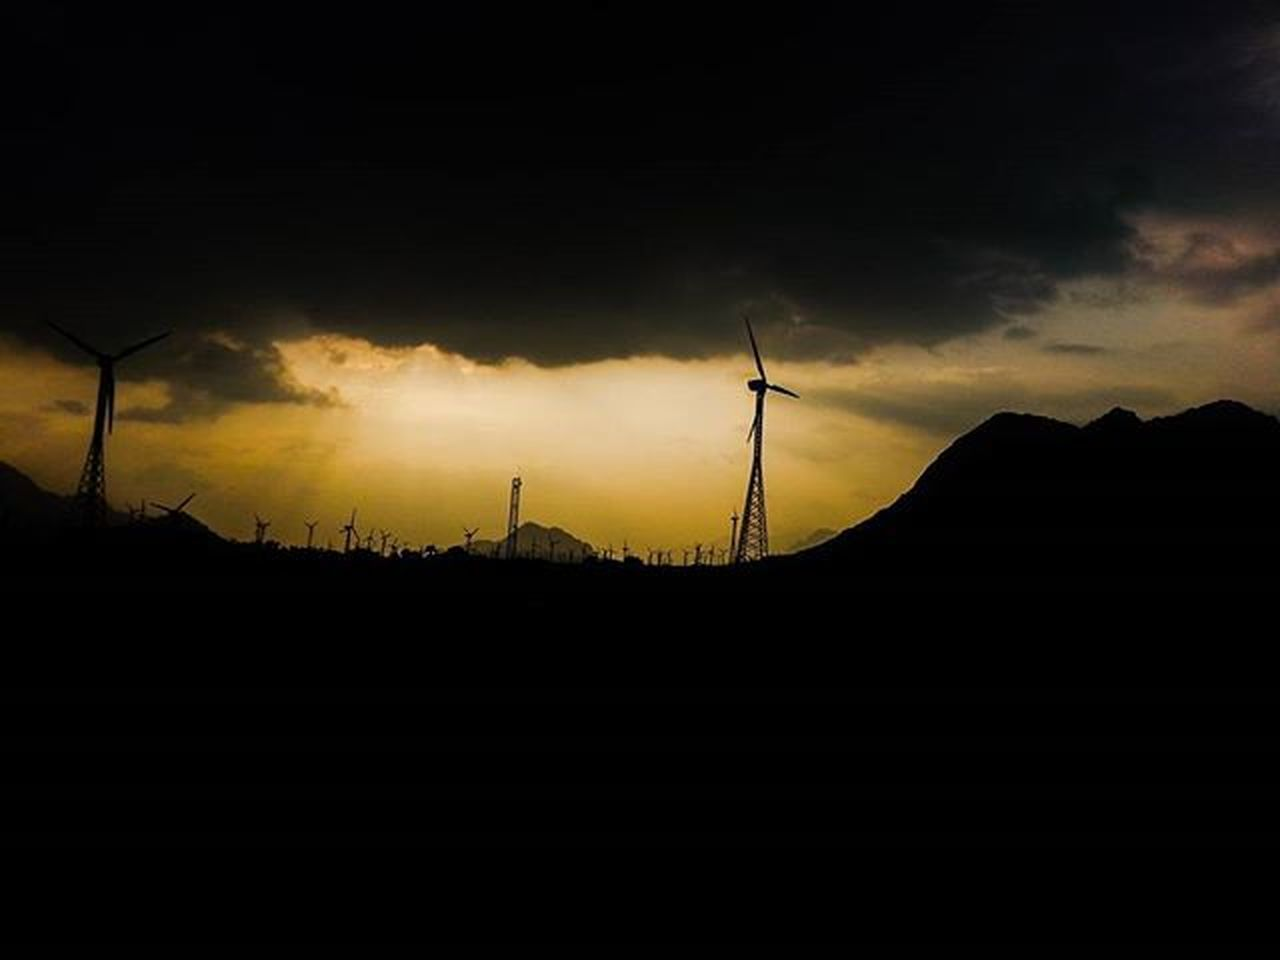 WIND MILLS Windmills Tirunelveli Sunset Sky Skyporn Colorsofnature Colorful Beautiful Bluesky Amber India South Southindia _soi Instatravel Travel Trainjourney Colorsofindia Tamilnadu 2015  Silhouette Travel Traveljournal Pixelpanda_india Incredibleindia picturesofindia indiapictures beautifulindia hippieinhills indiatravelgram